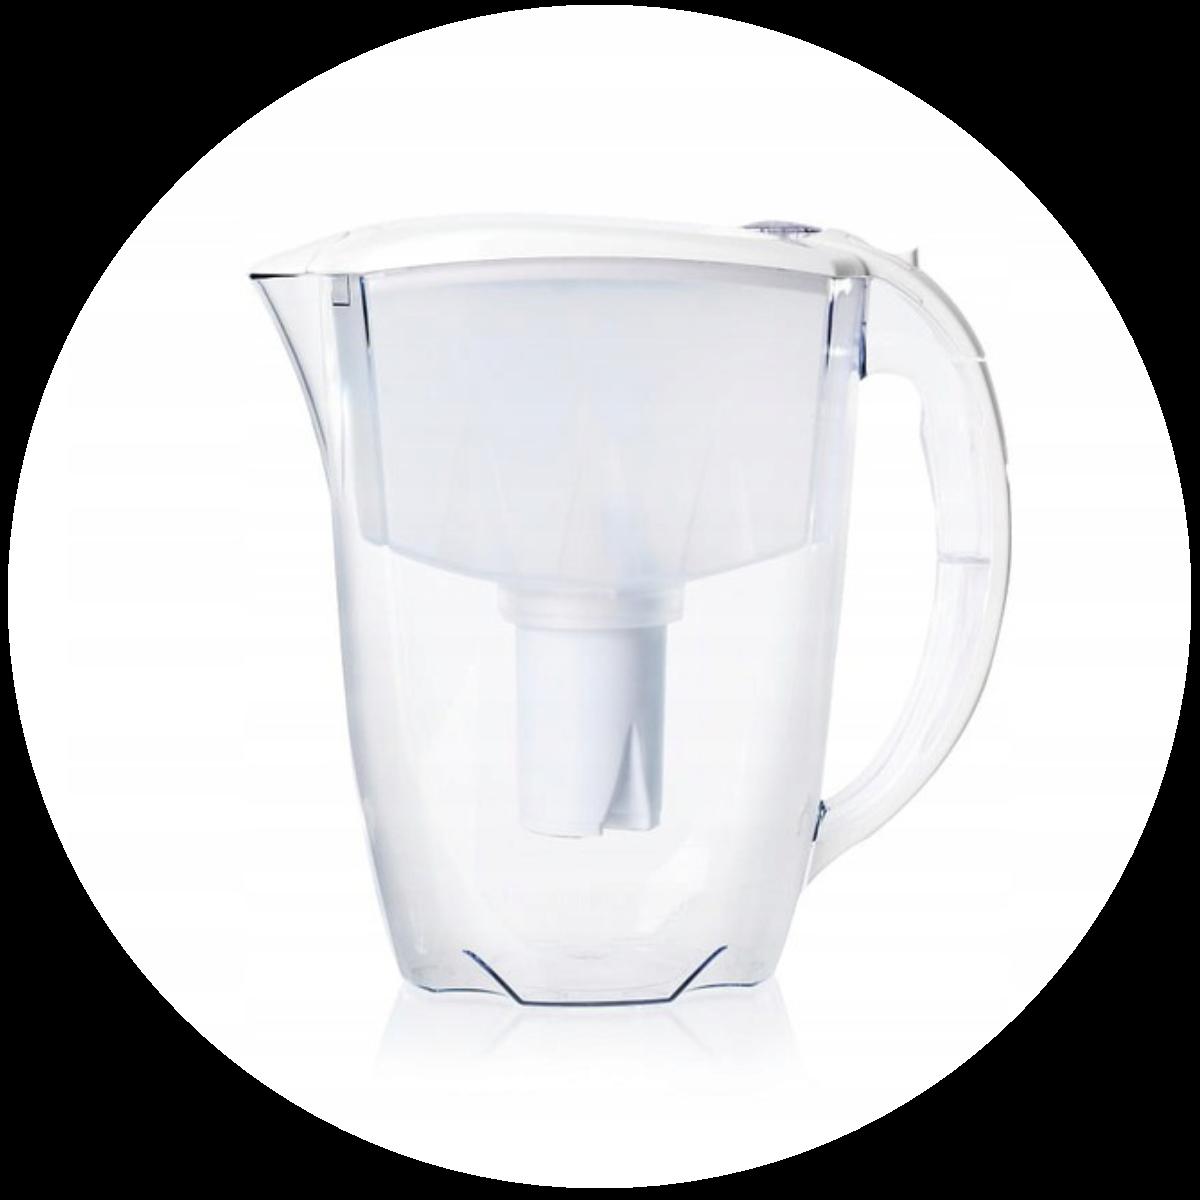 Aquaphor Ideal (biały) dzbanek filtrujący - kształt